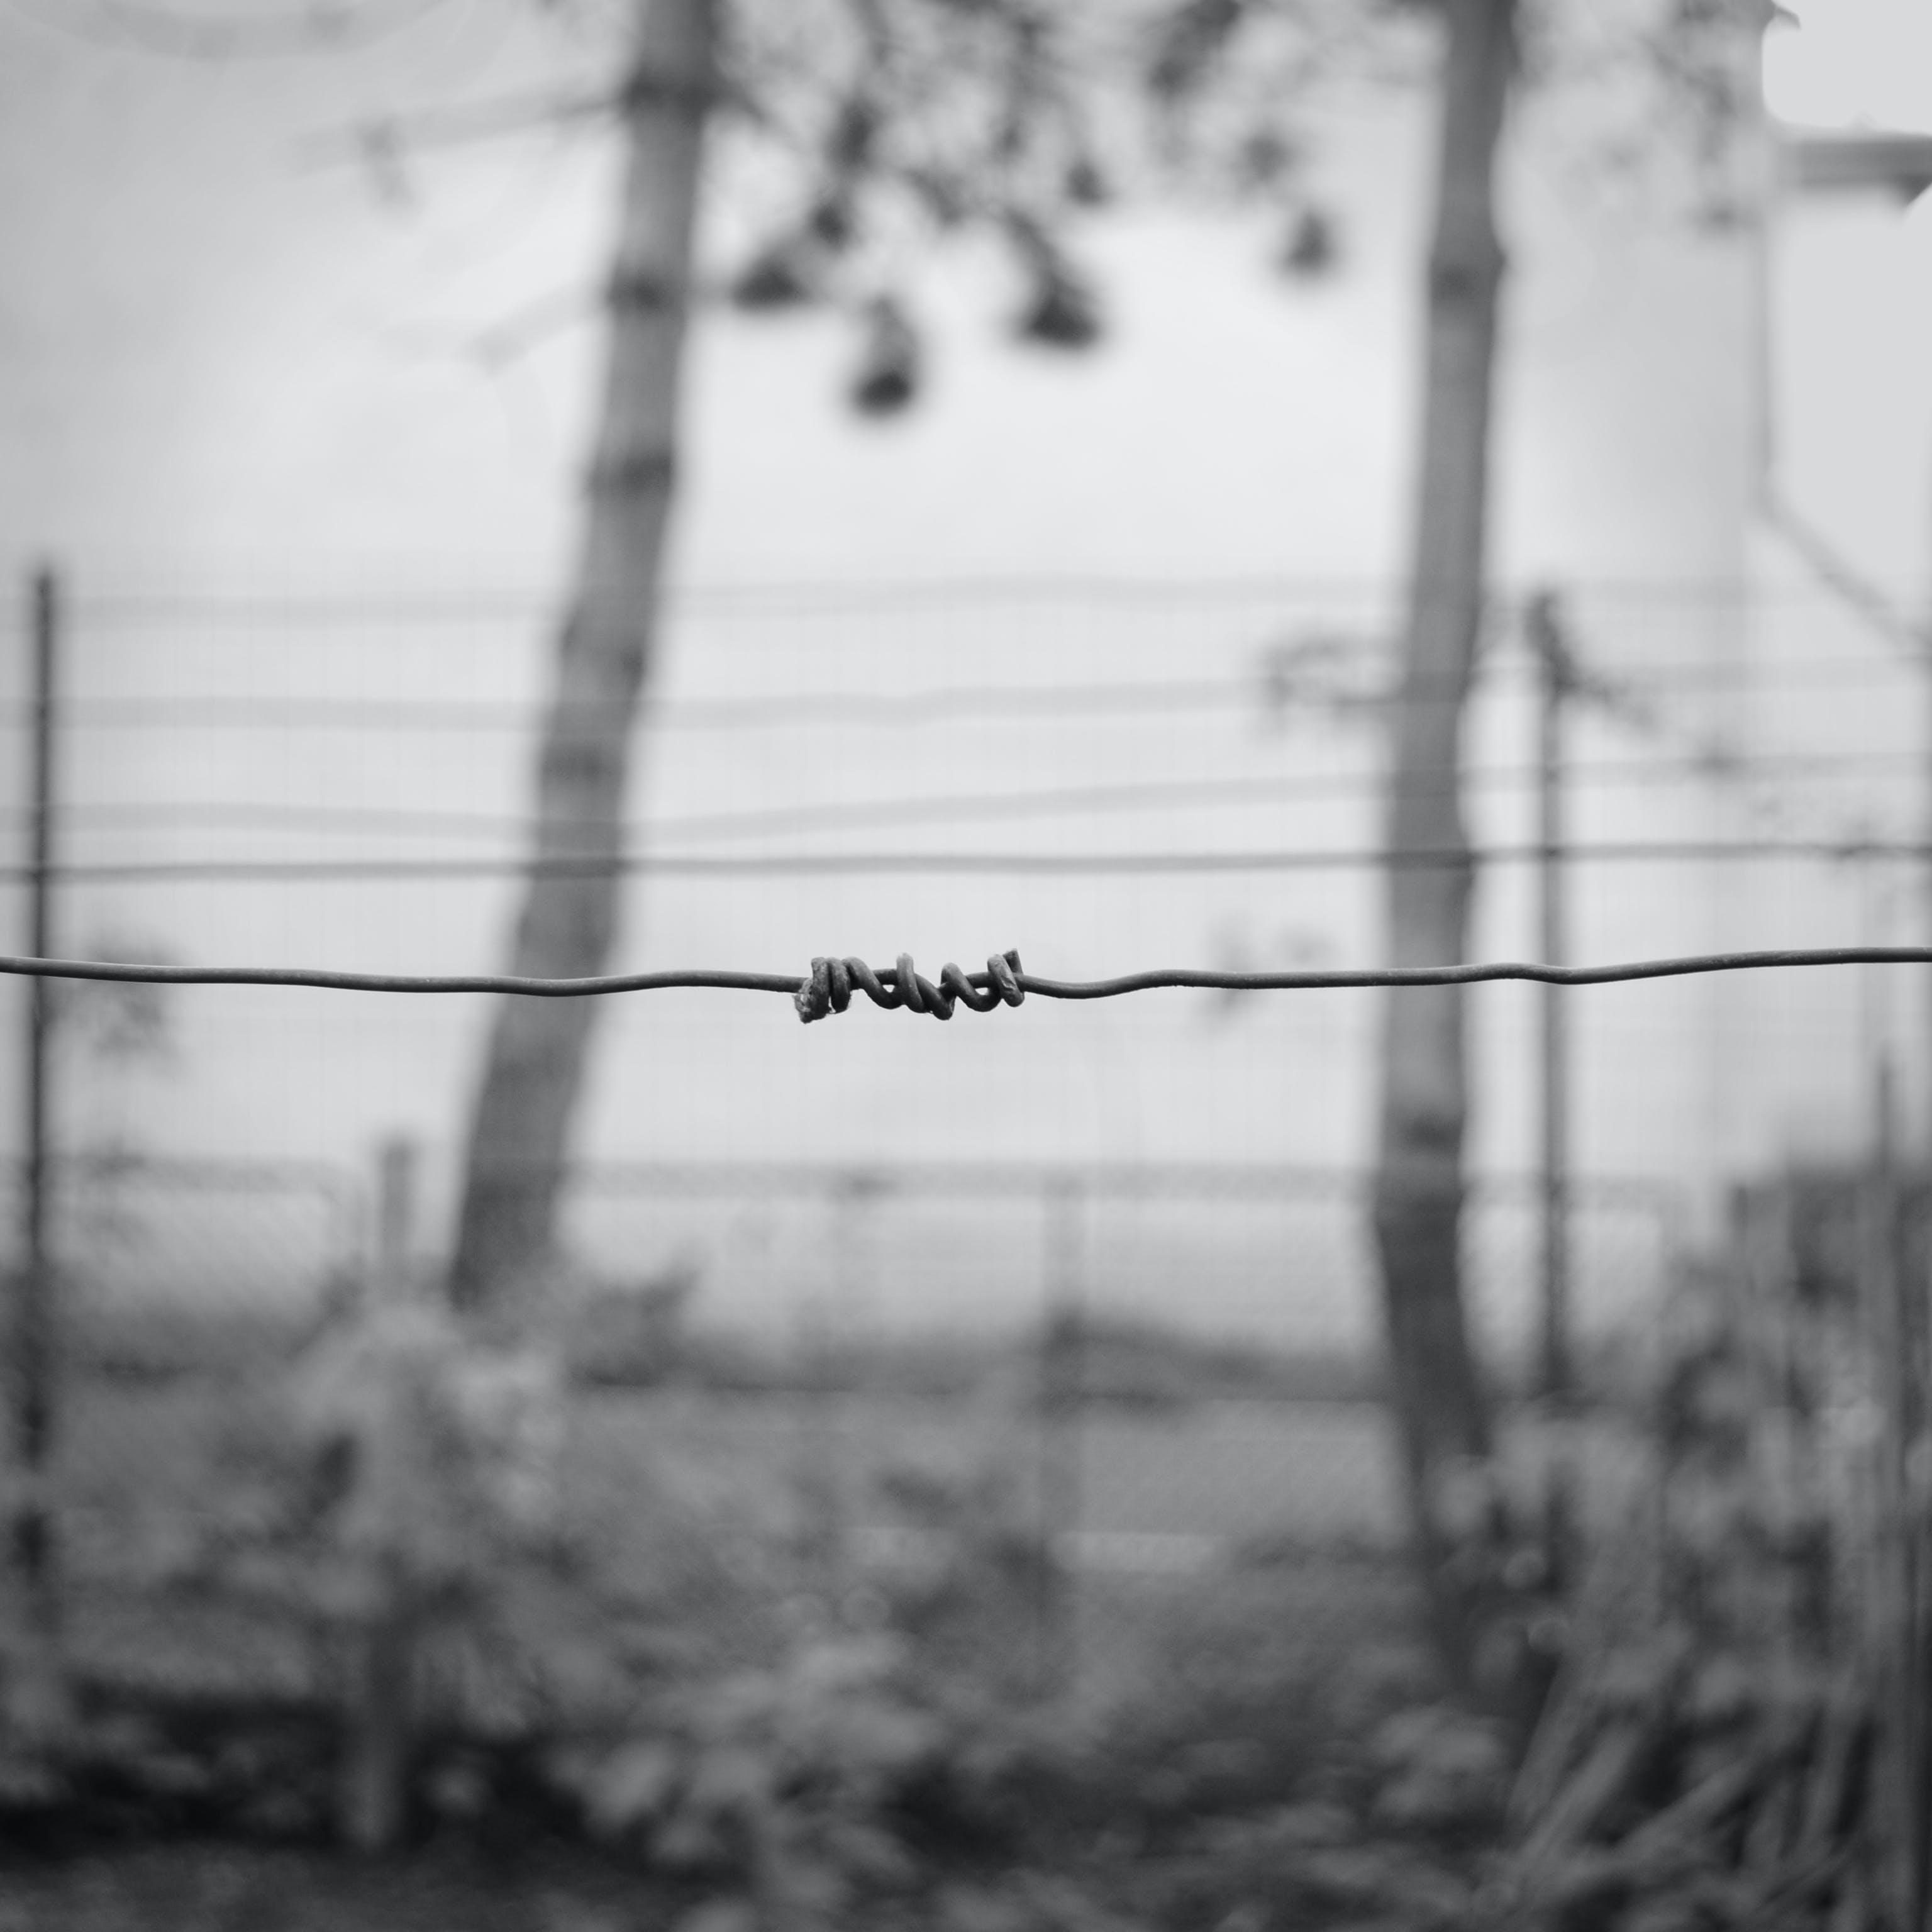 Free stock photo of barbed wire, black and white, depression, escape